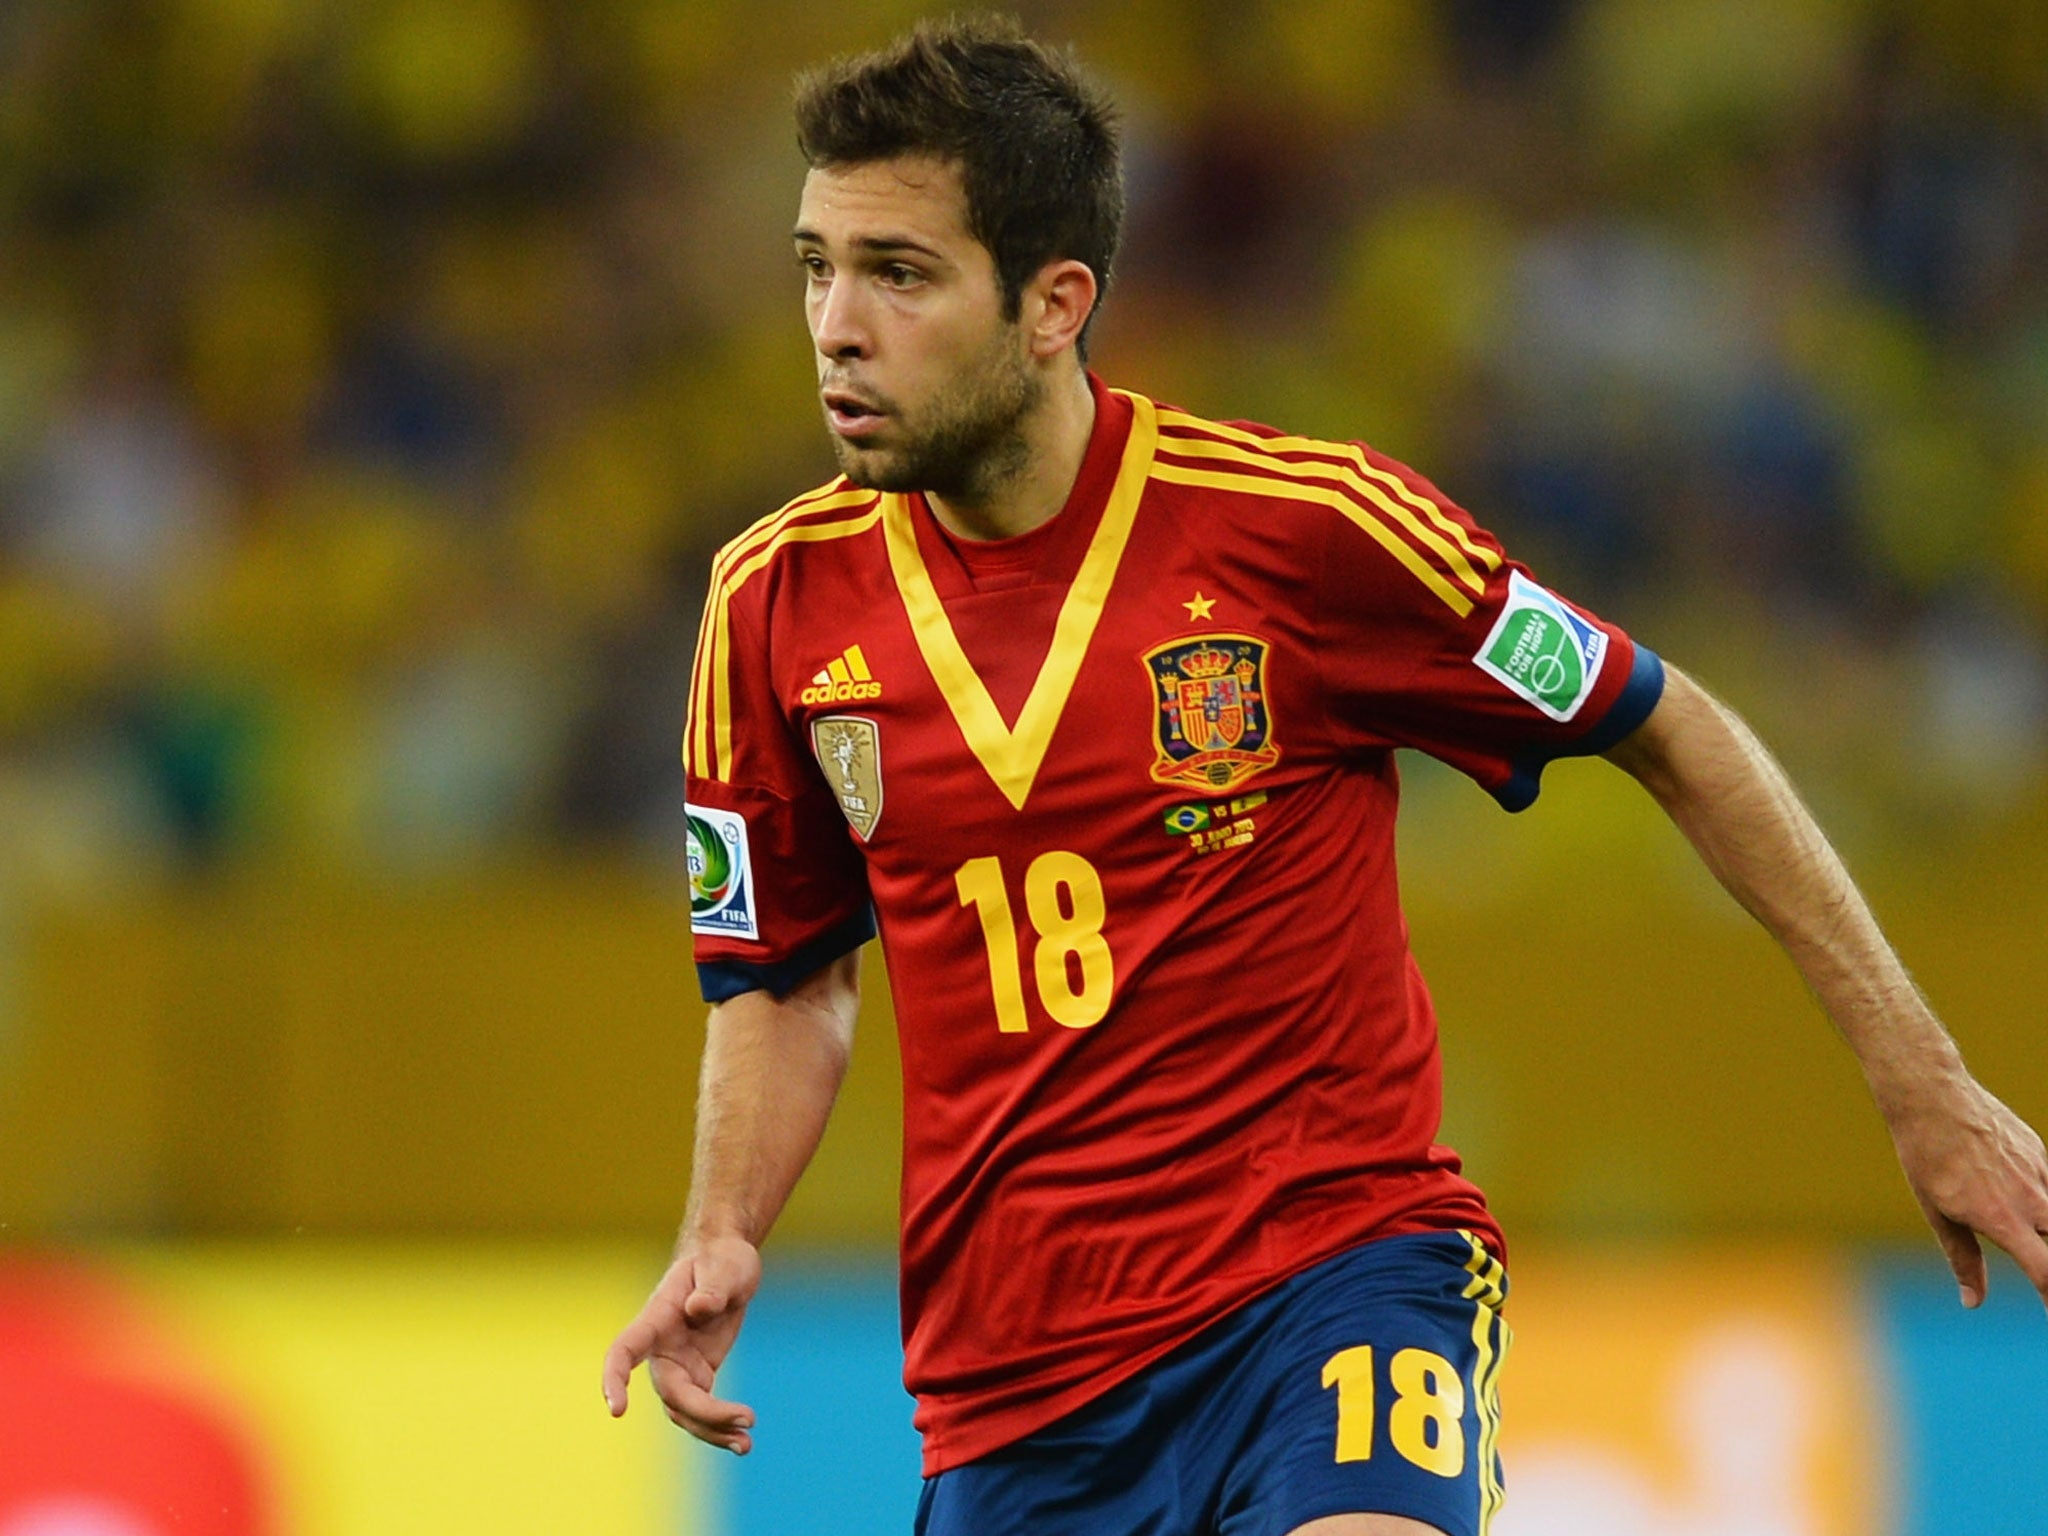 world cup 2014 player profile jordi alba the spain